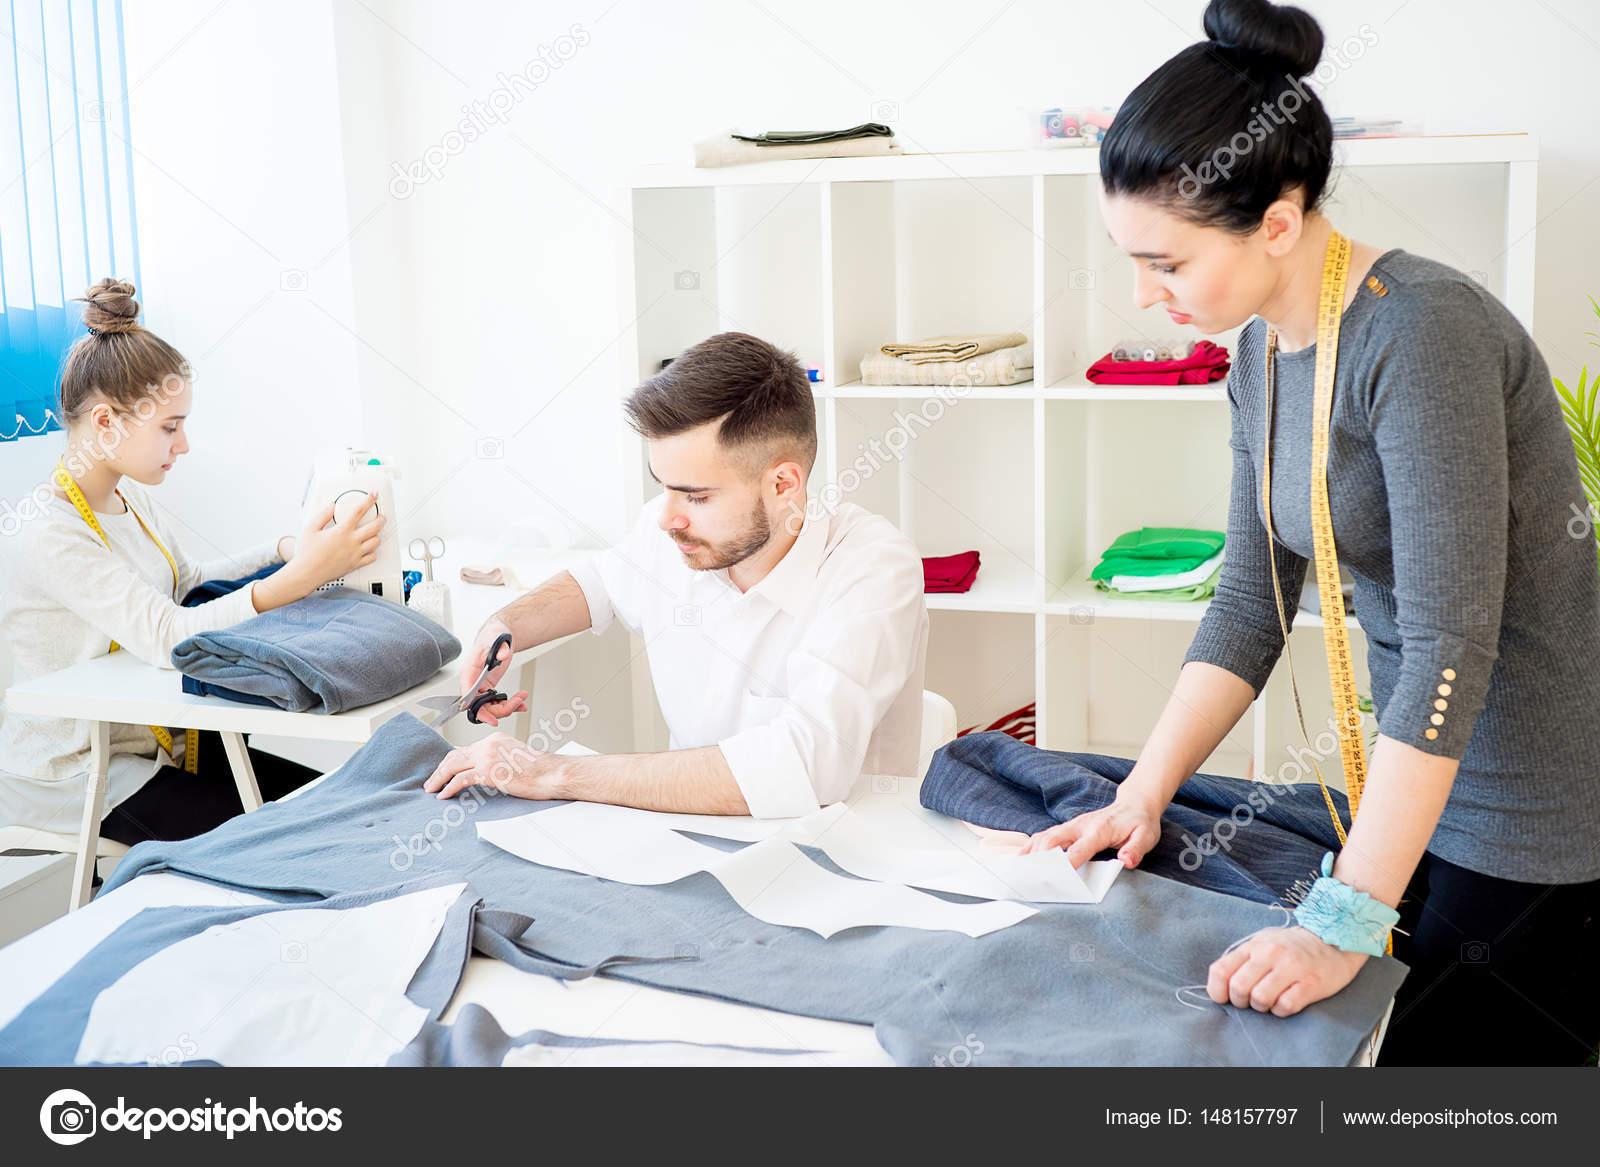 fashion designers at work \u2014 stock photo © lenanichizhenova 148157797fashion designers at work \u2014 stock photo